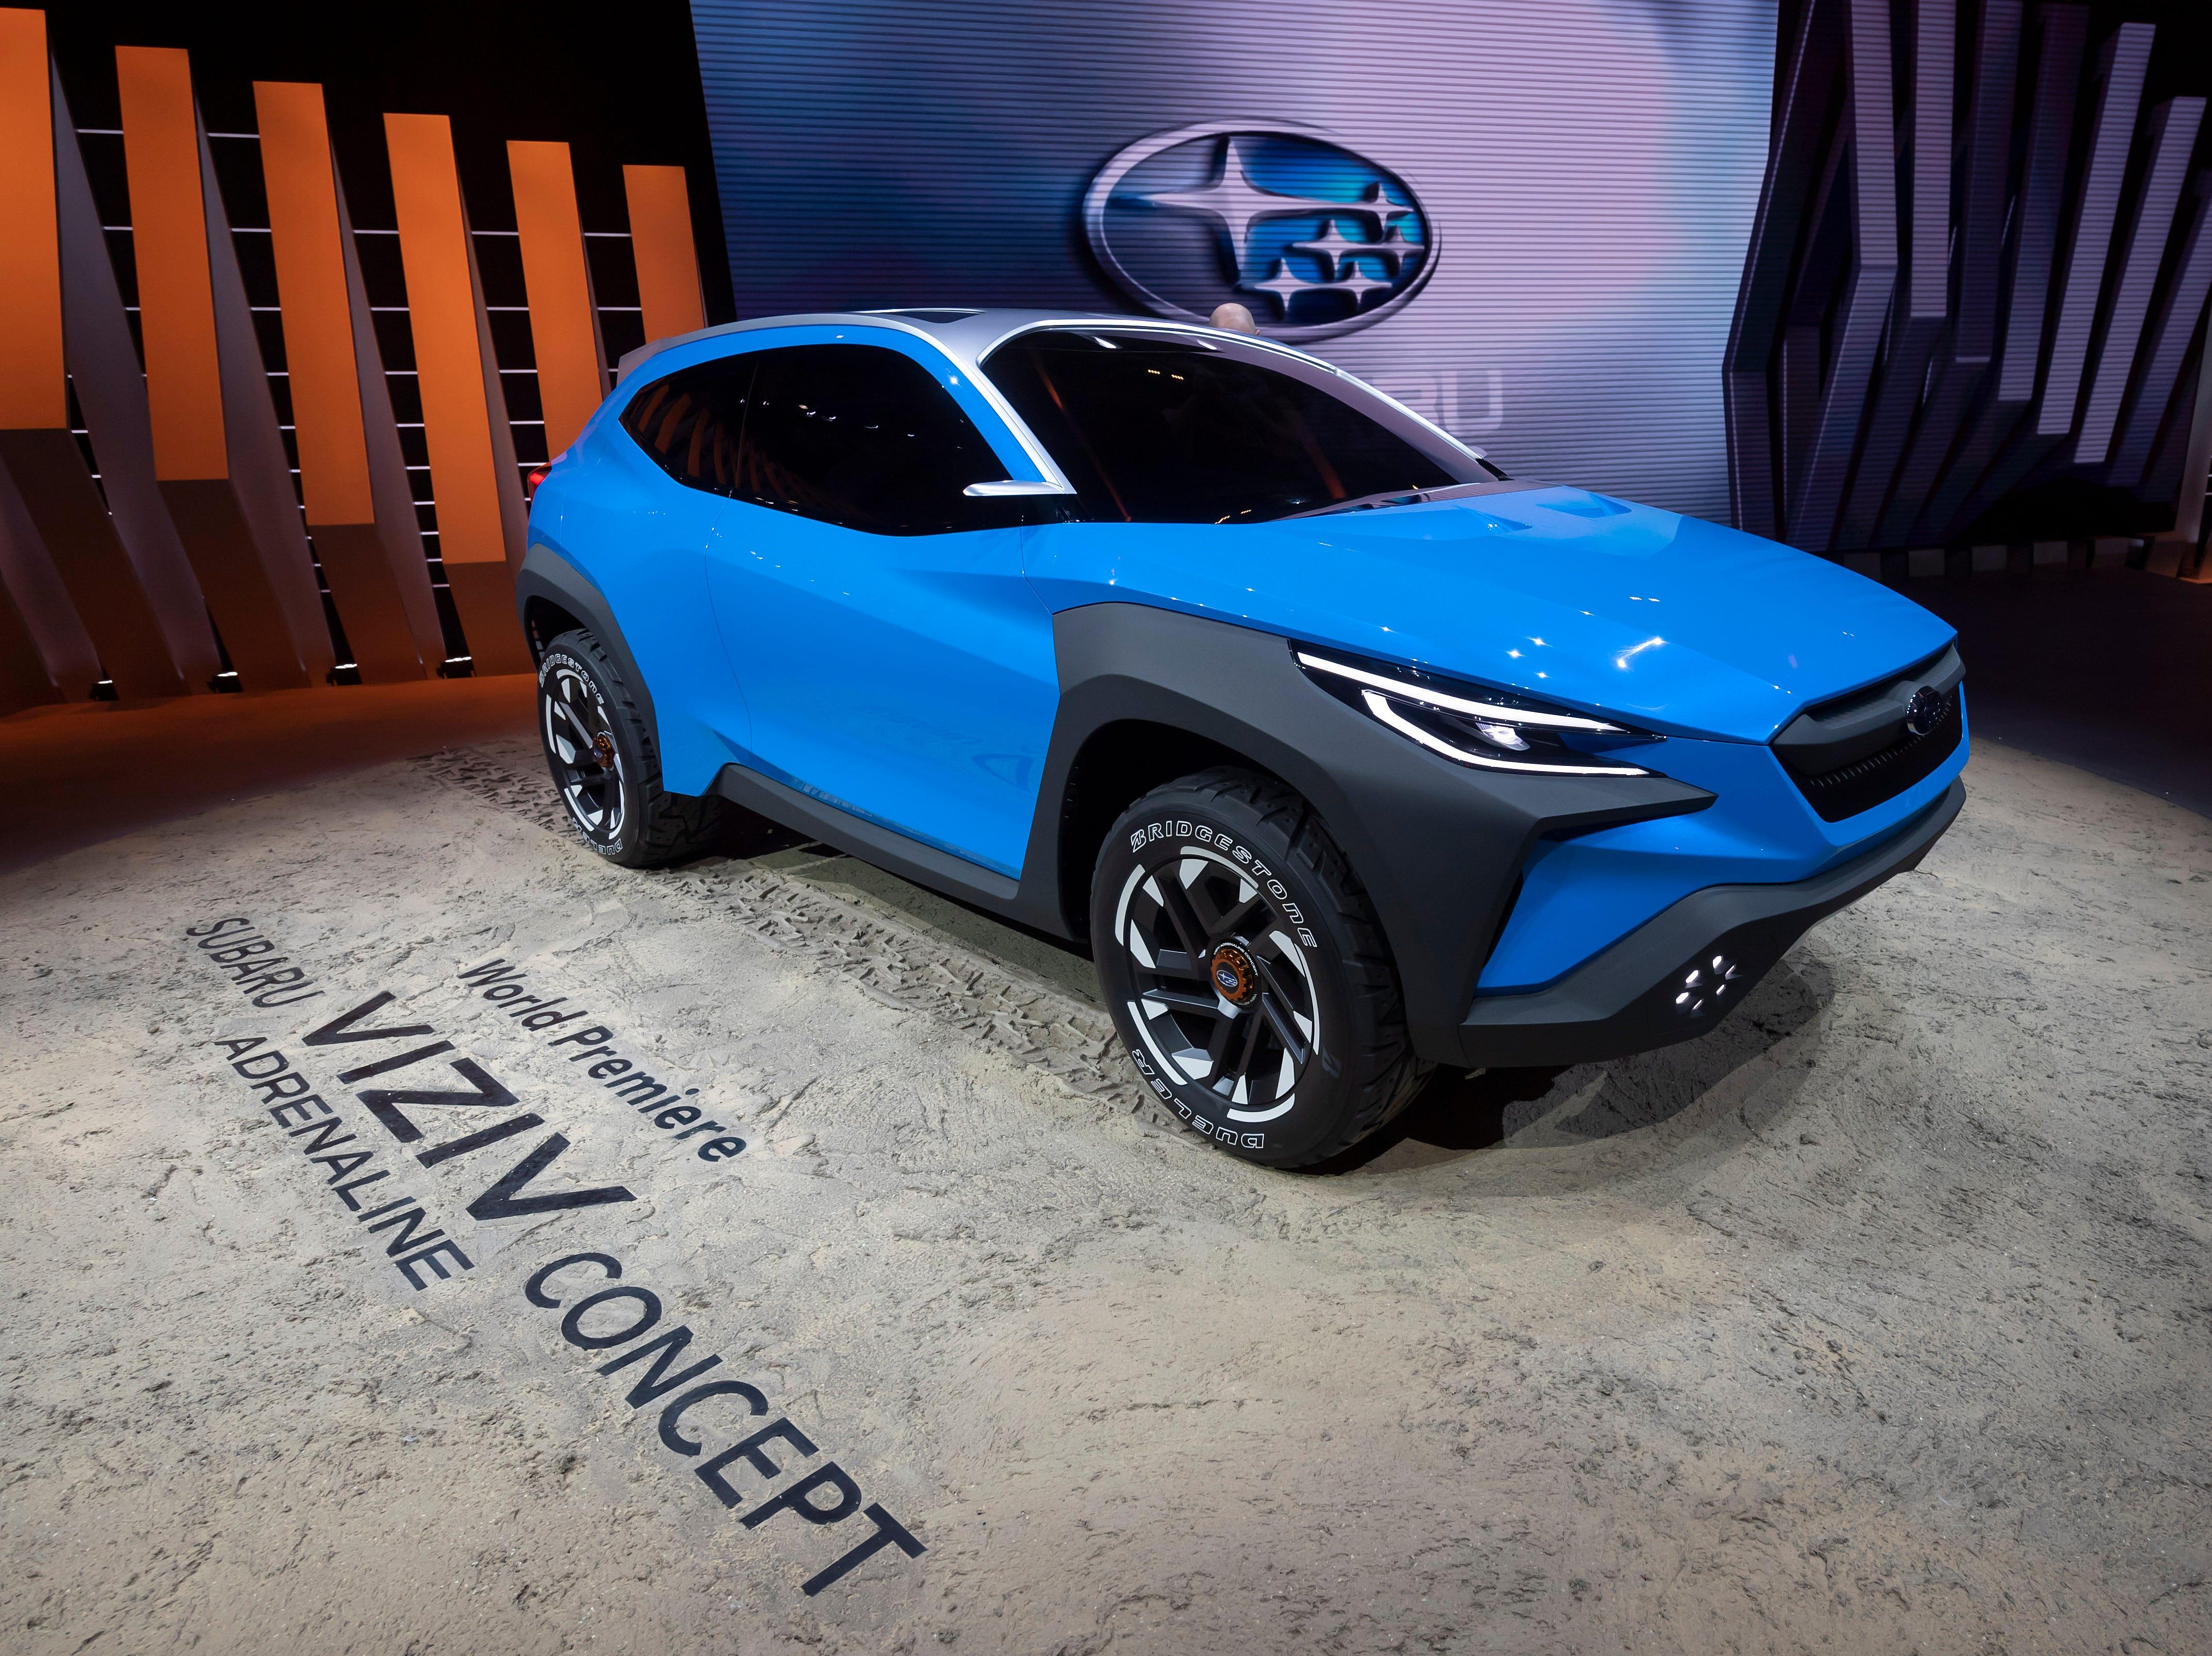 The Subaru Viziv Concept is presented.